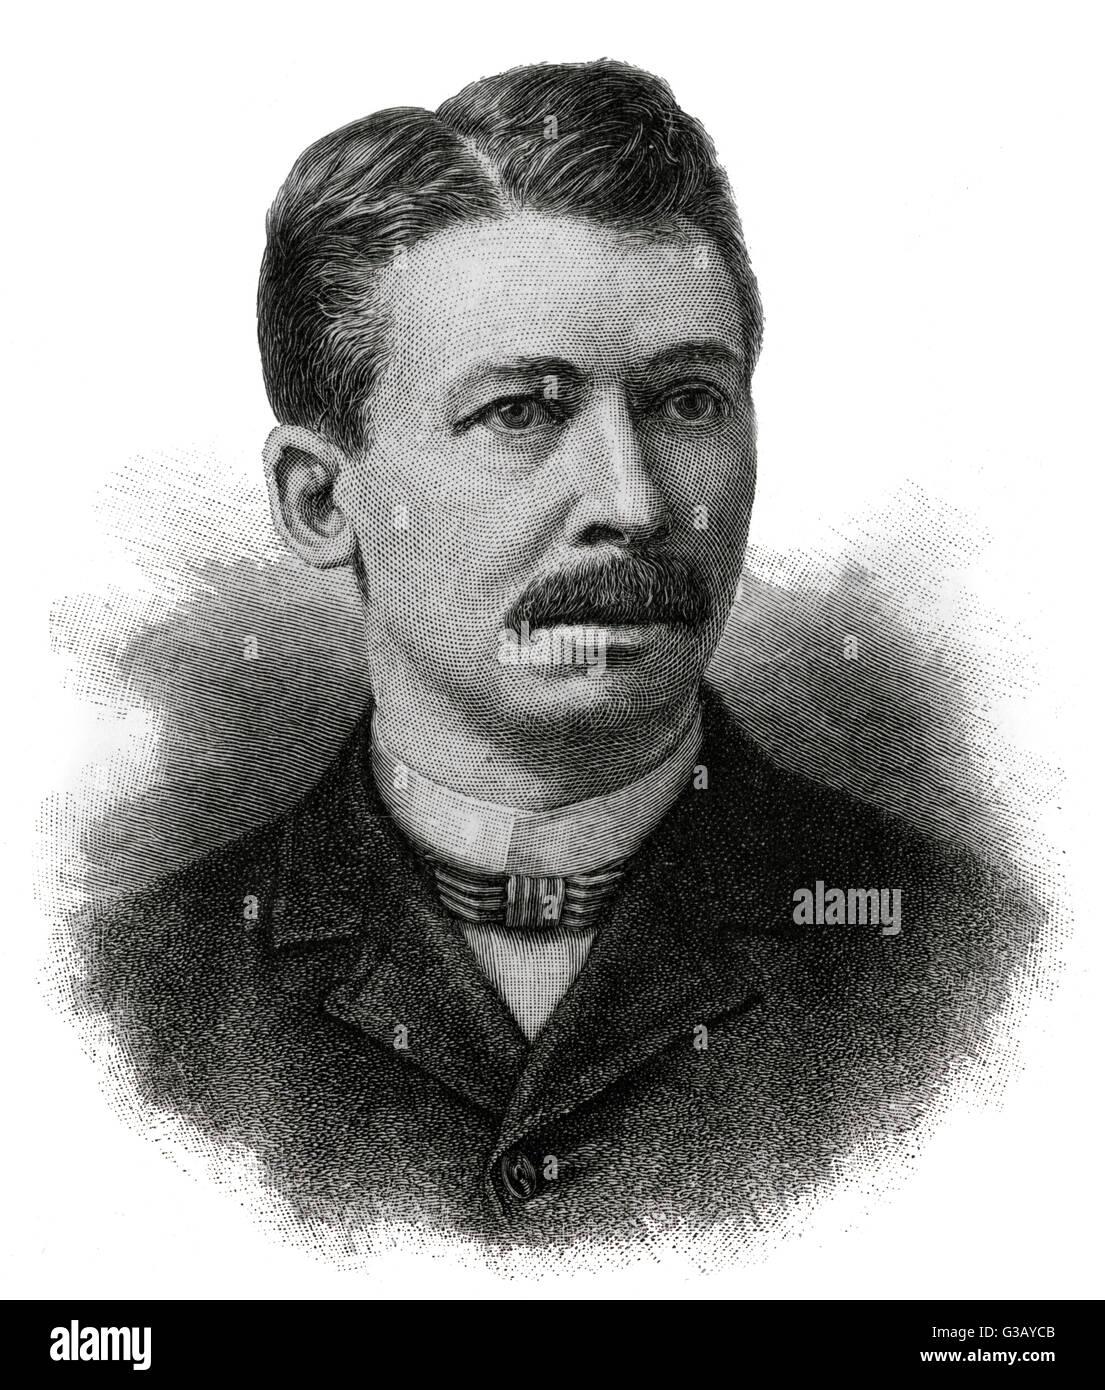 JOEL CHANDLER HARRIS  American author, creator  of 'Uncle Remus'       Date: 1848 - 1908 - Stock Image